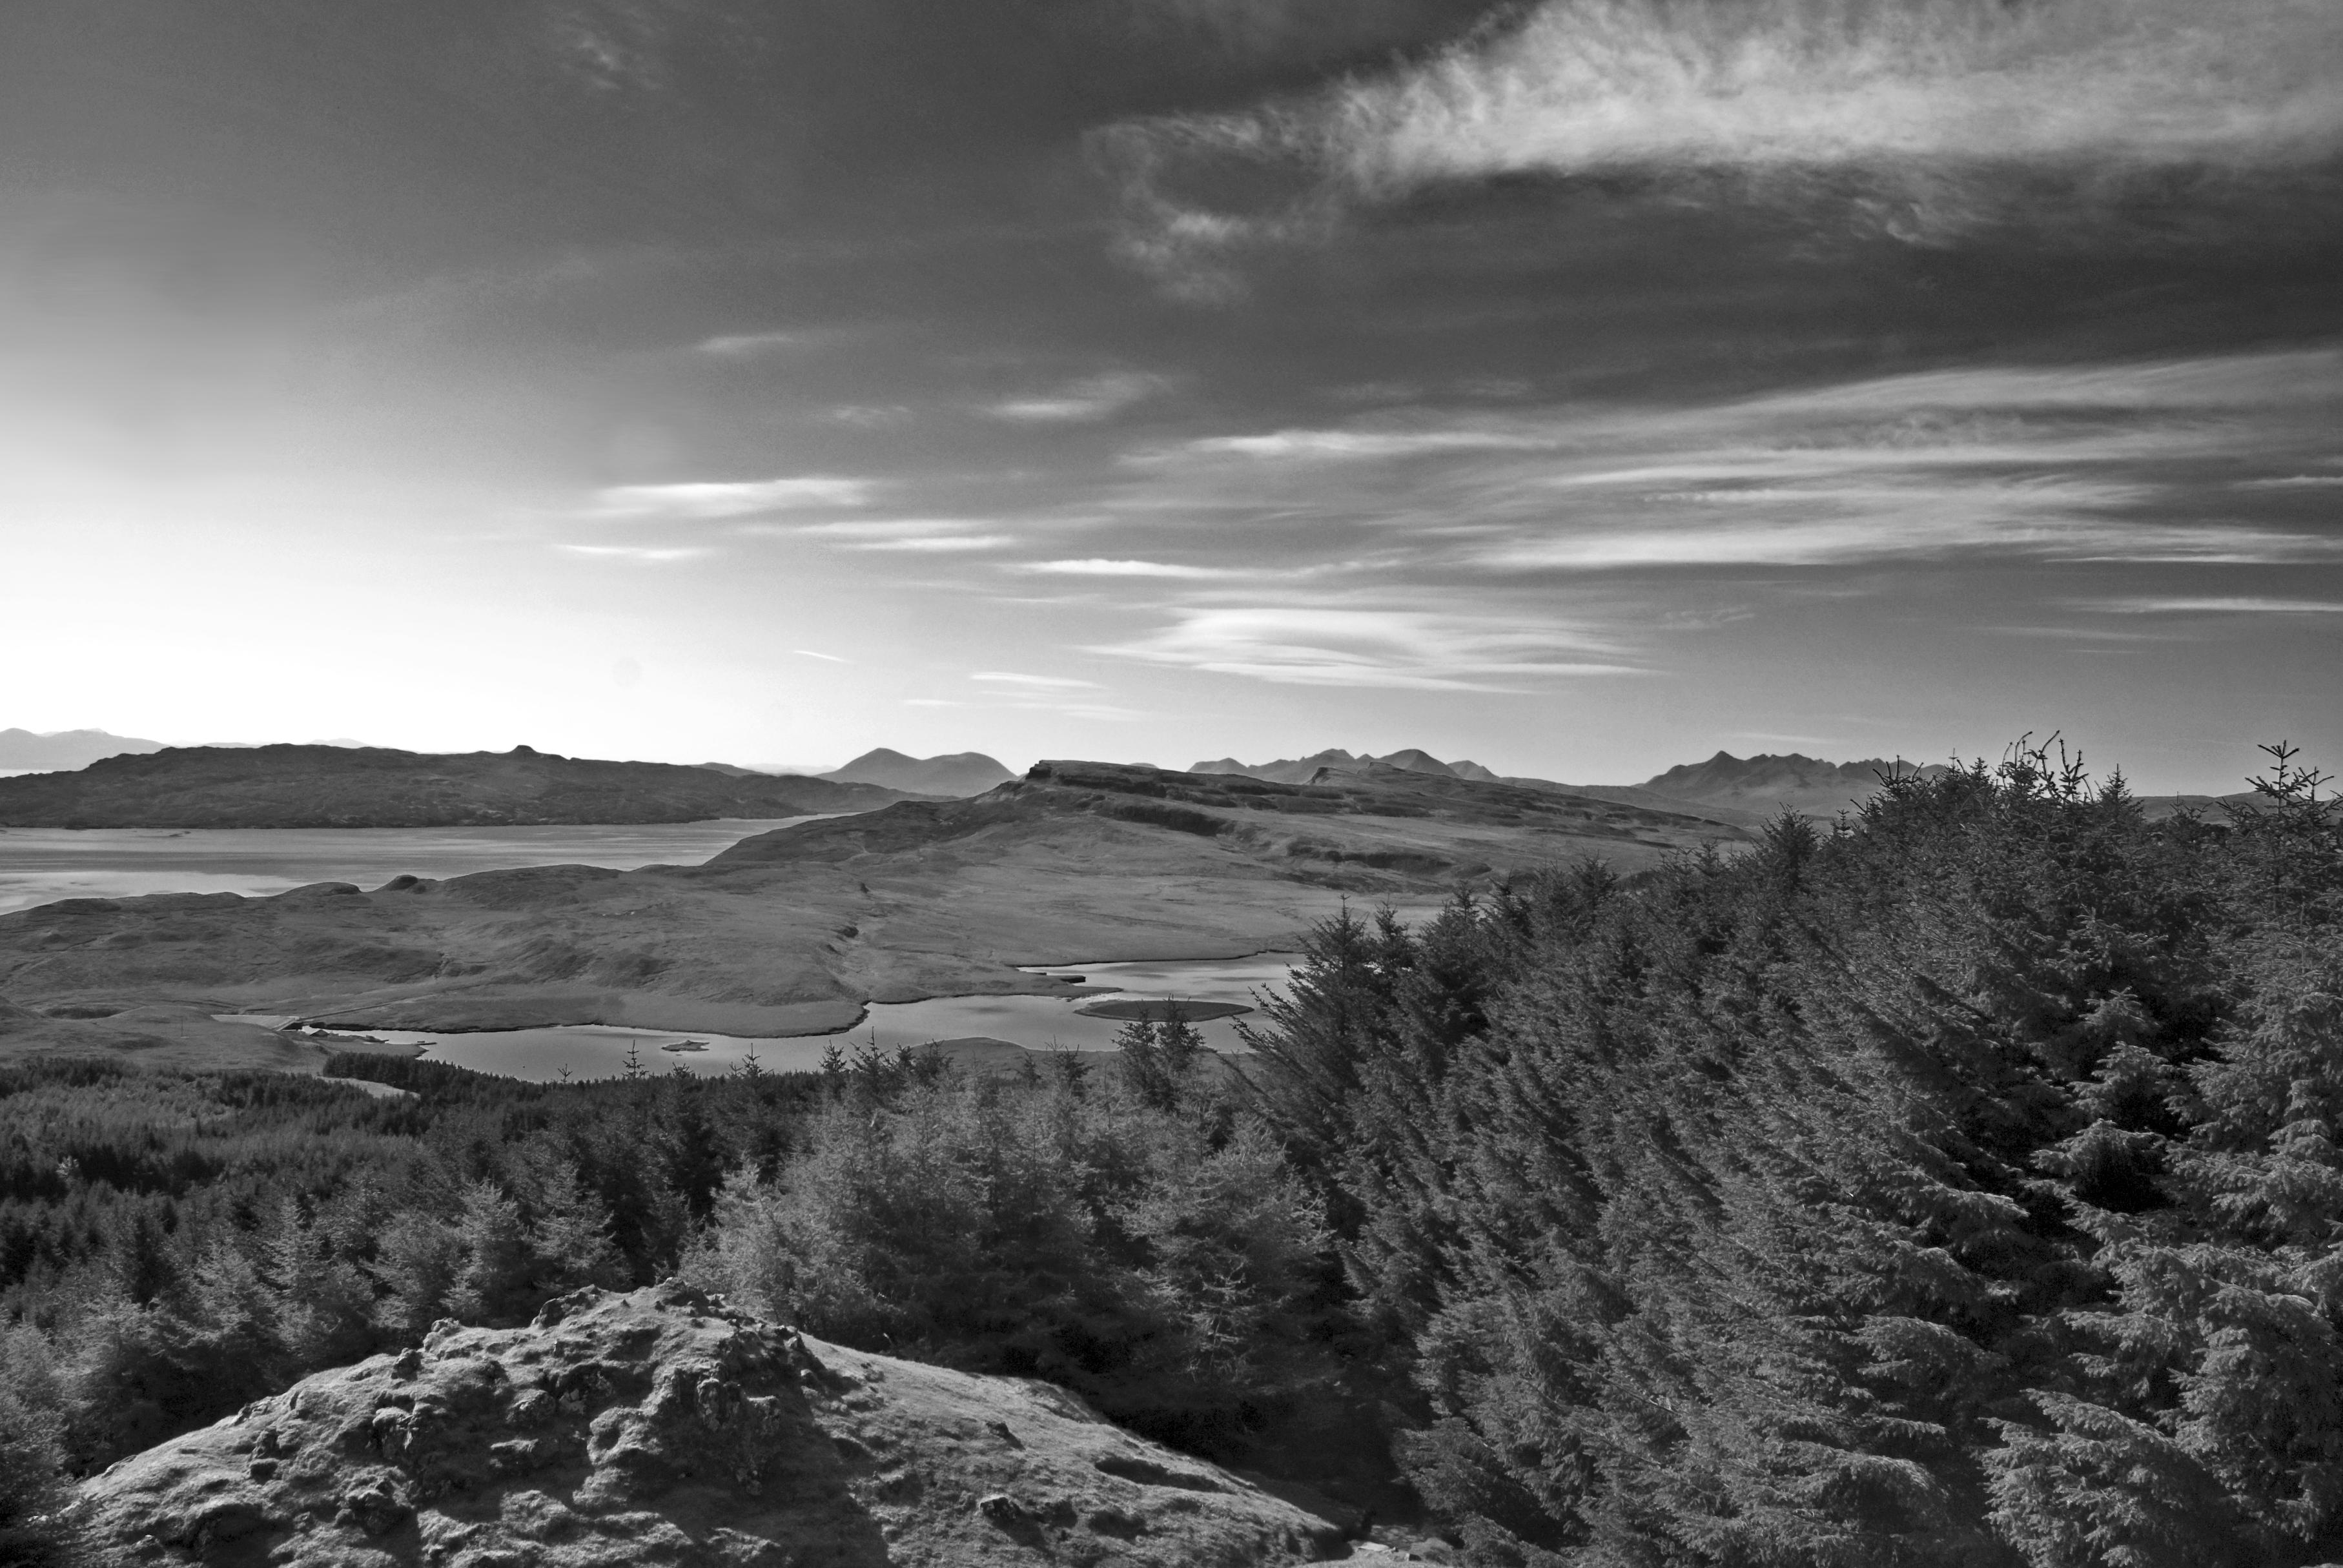 File:Beautiful landscape in black and white, Scotland (5831890202 ...